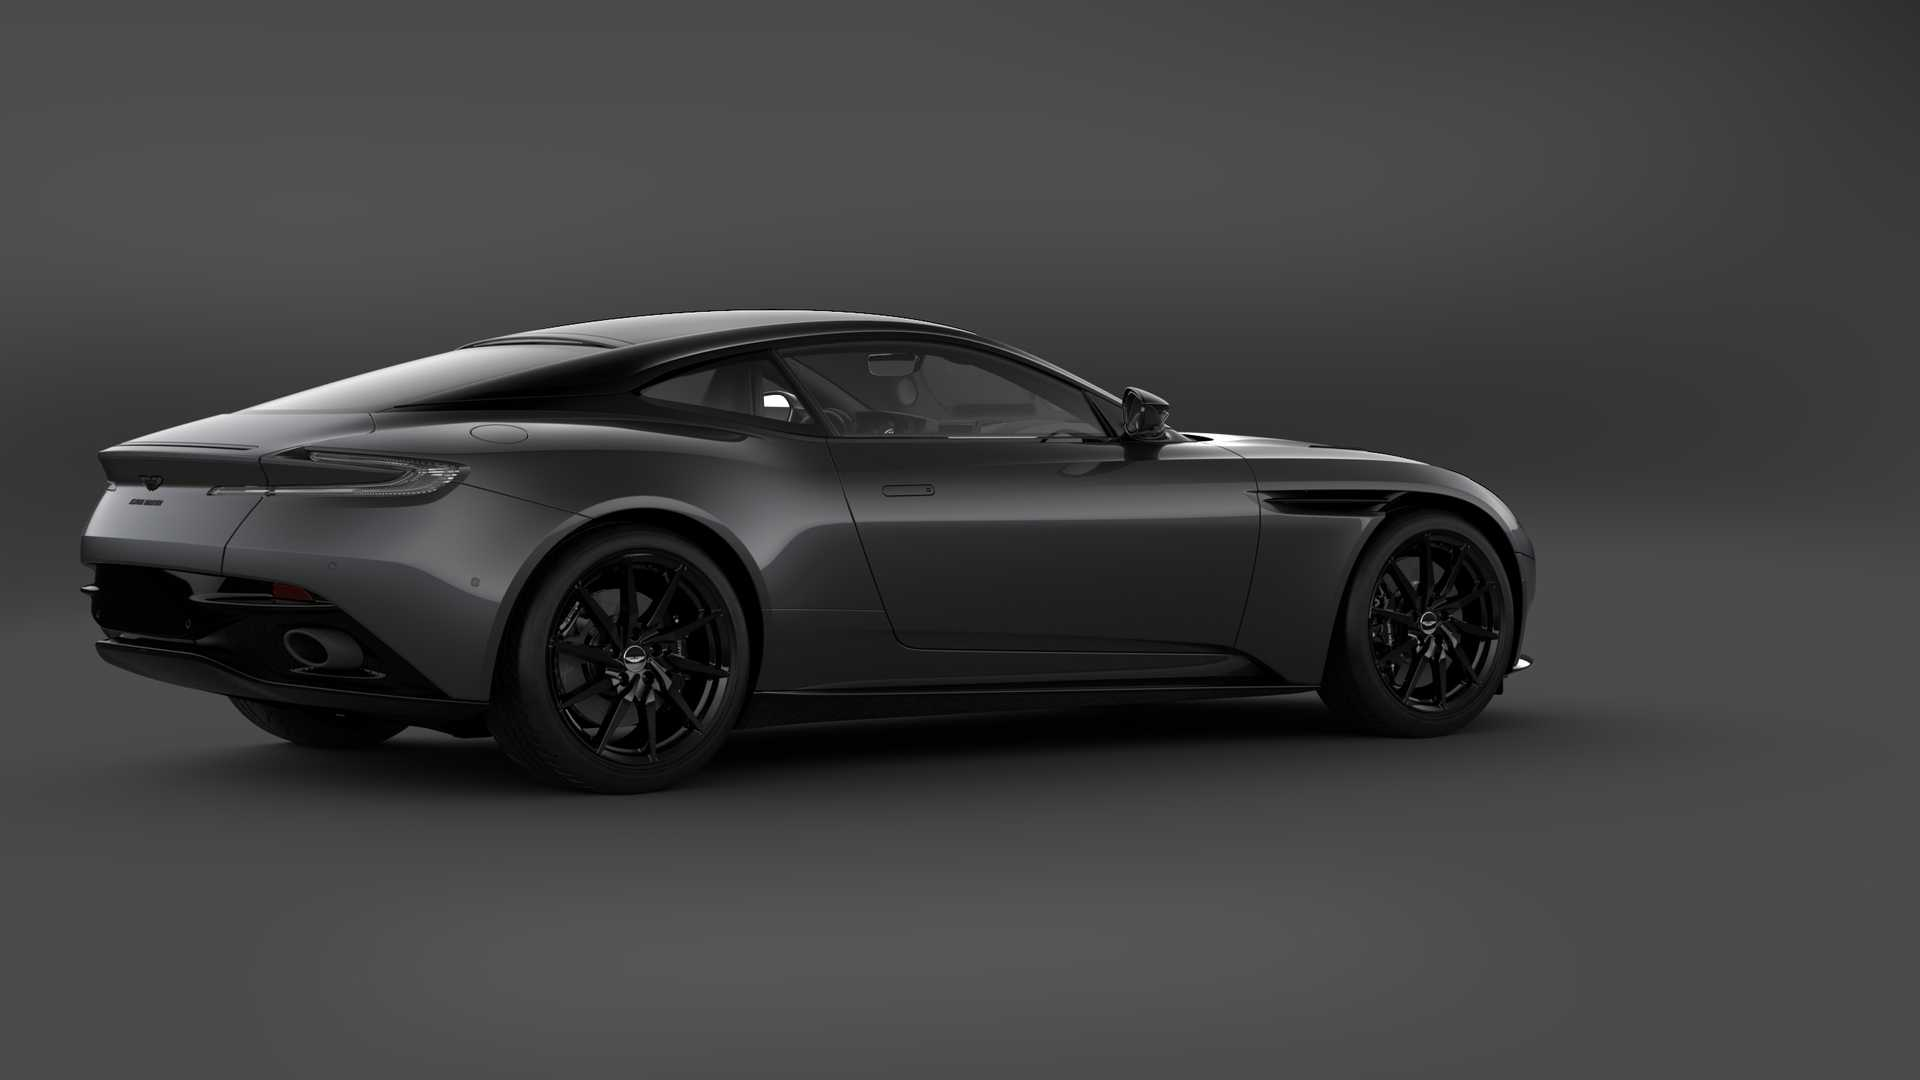 Aston-Martin-DB11-V8-Shadow-Edition-14